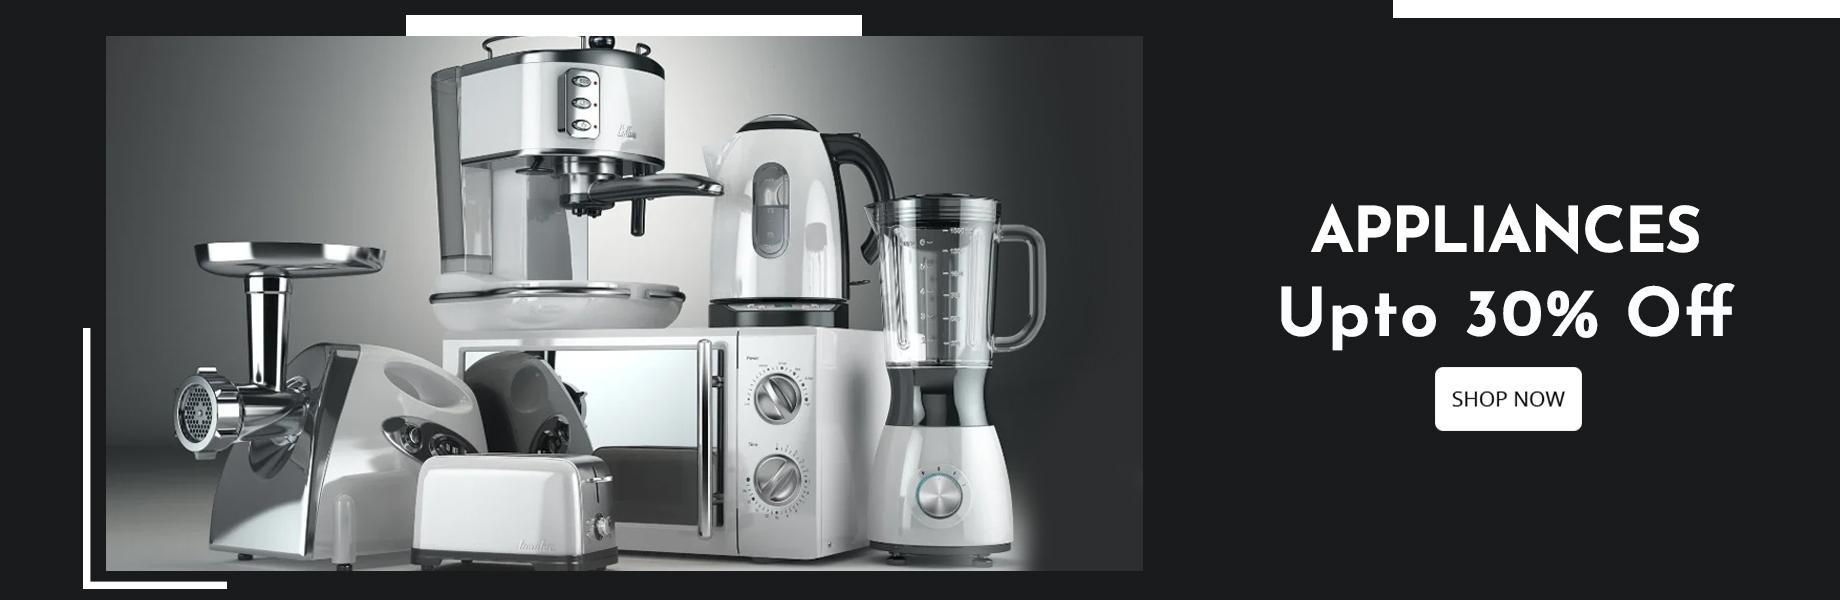 appliances---Crousals--web.jpg